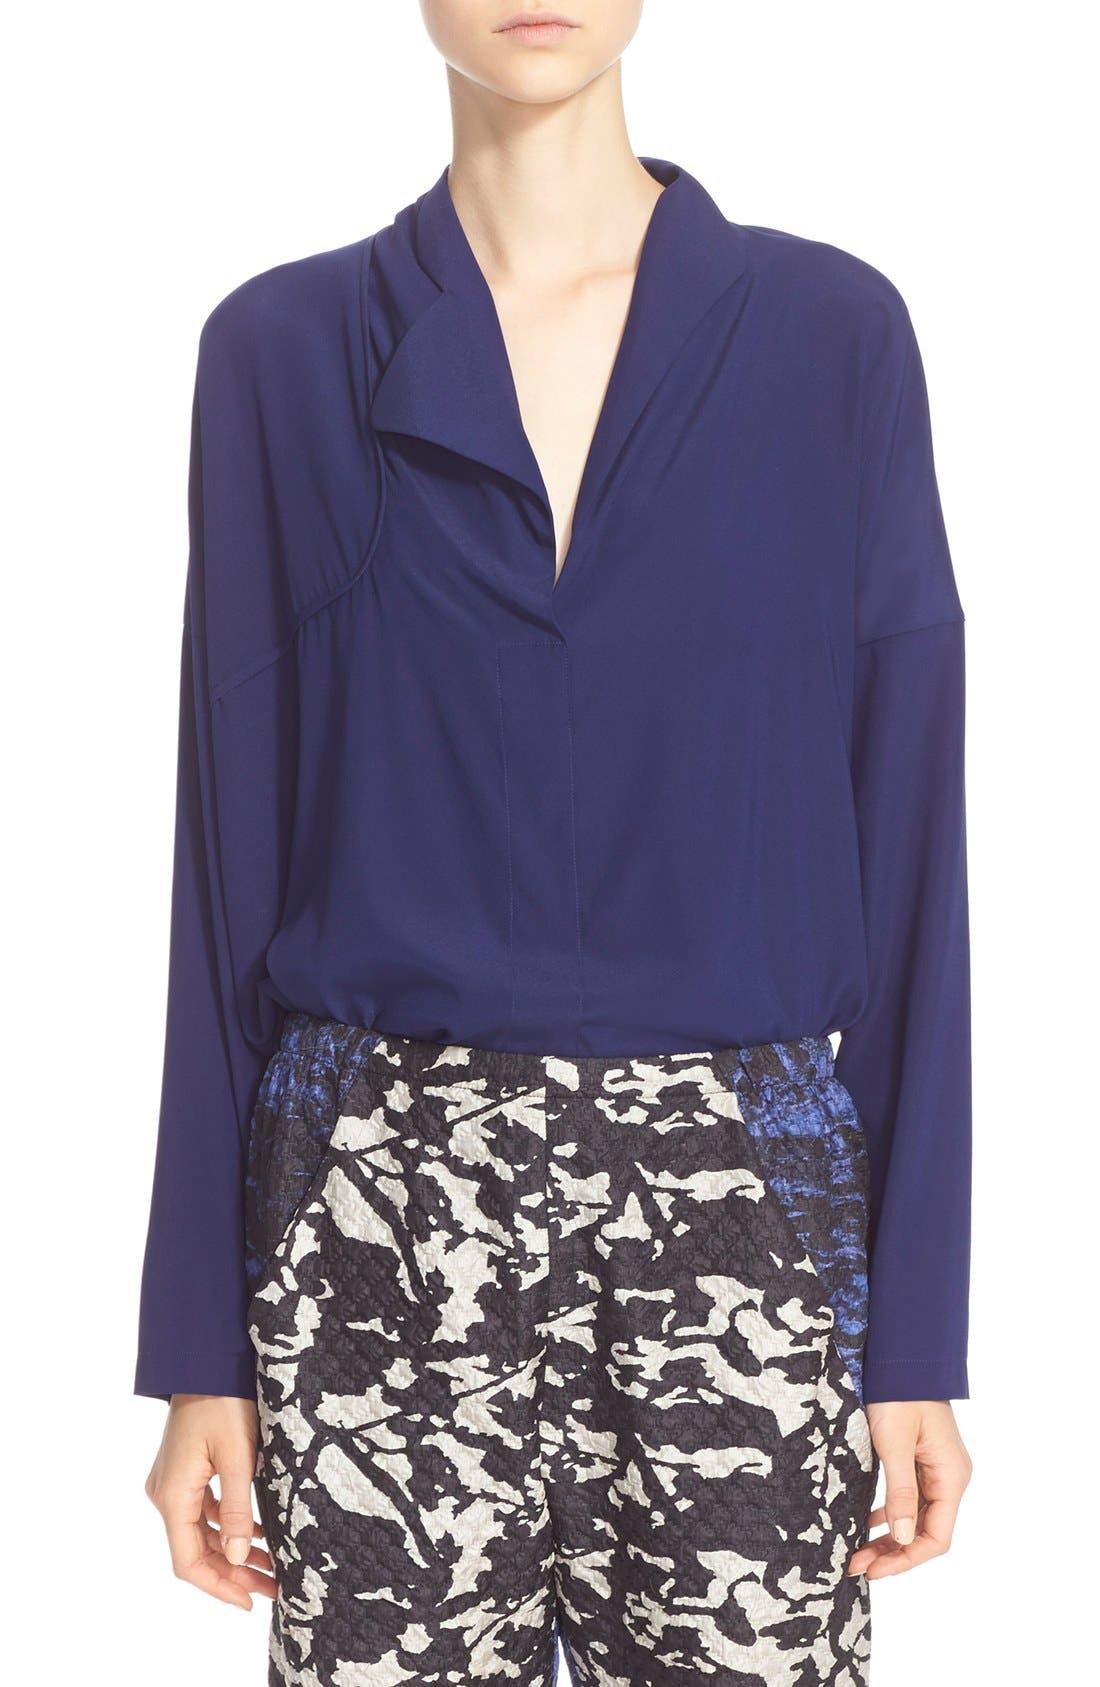 Alternate Image 1 Selected - Zero + Maria Cornejo 'Edi' Stretch Silk Charmeuse Shirt